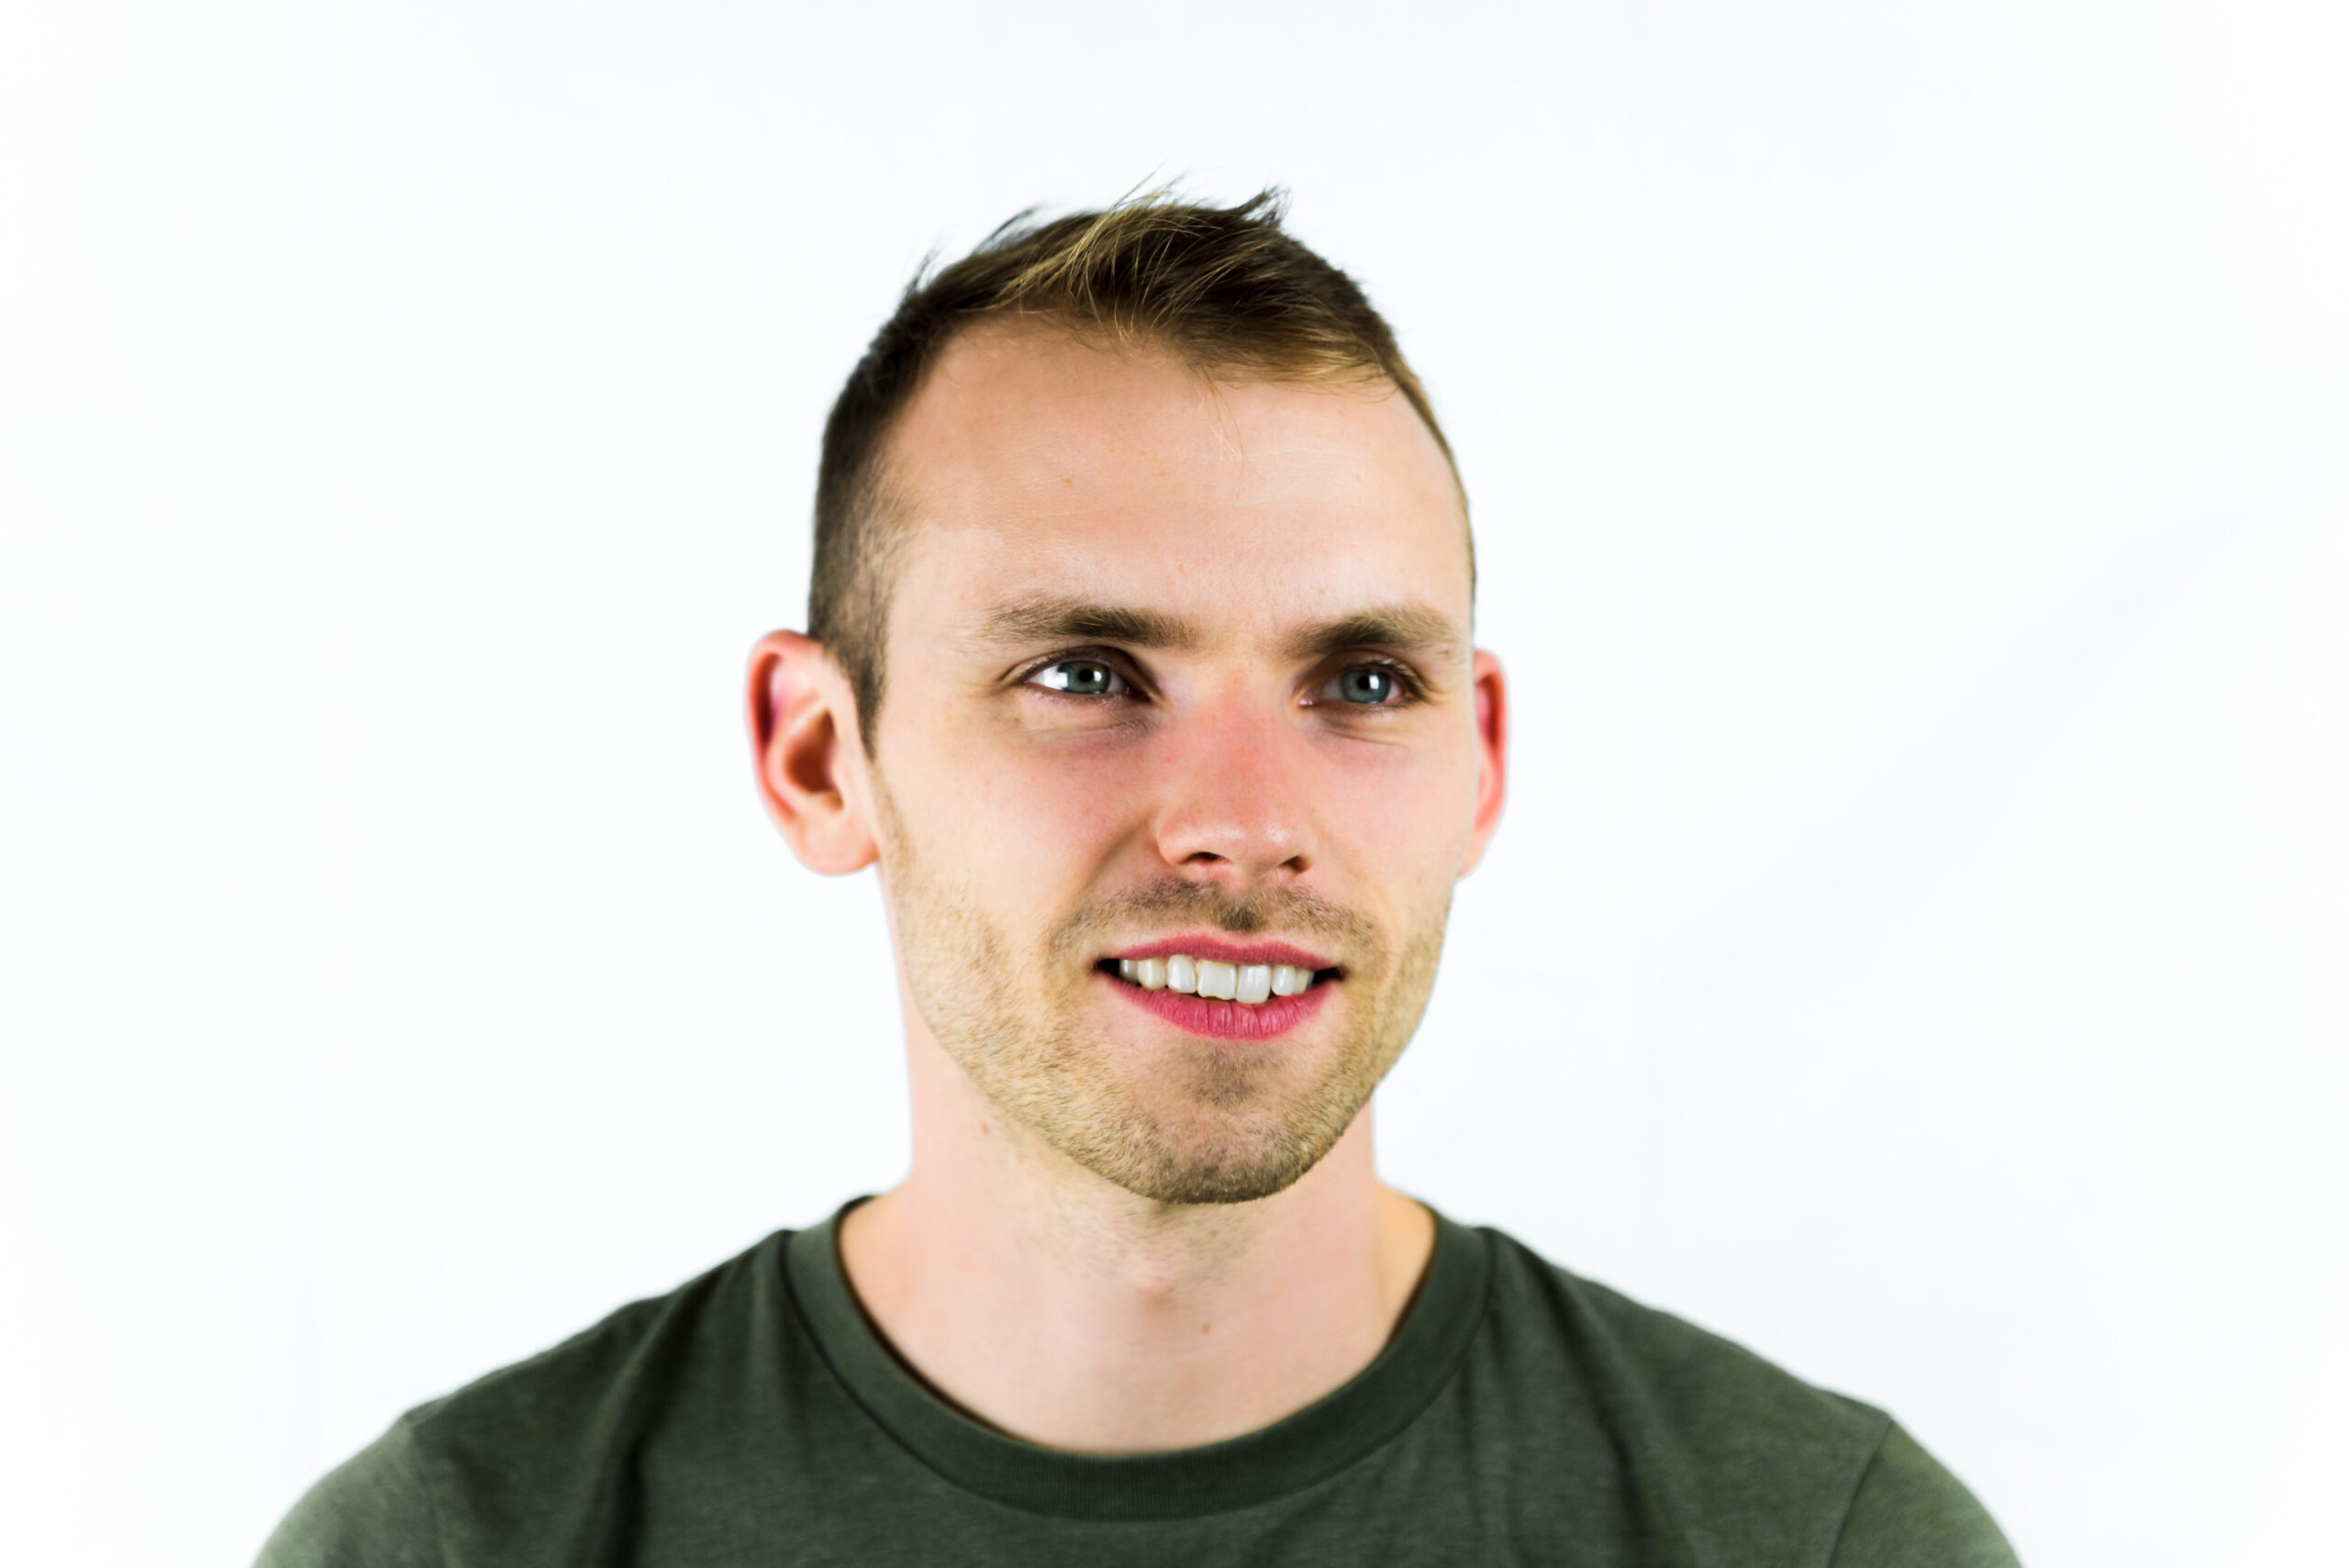 Copywriter, marketing, freelance